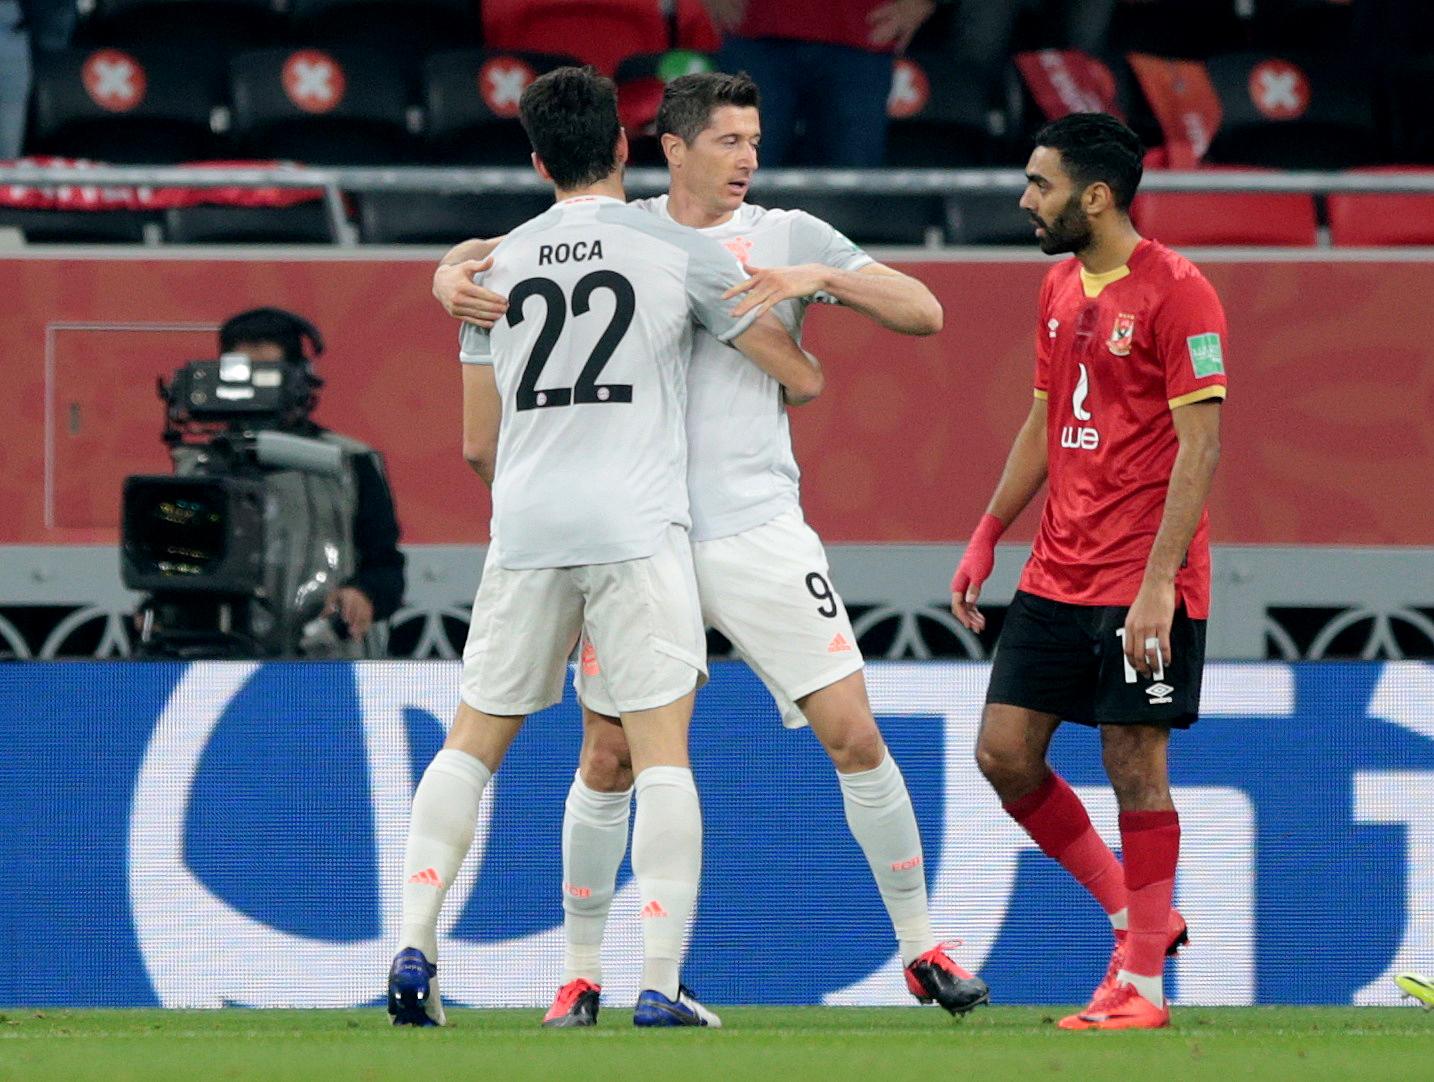 Bayern vence o Ahly e está na final do Mundial de Clubes